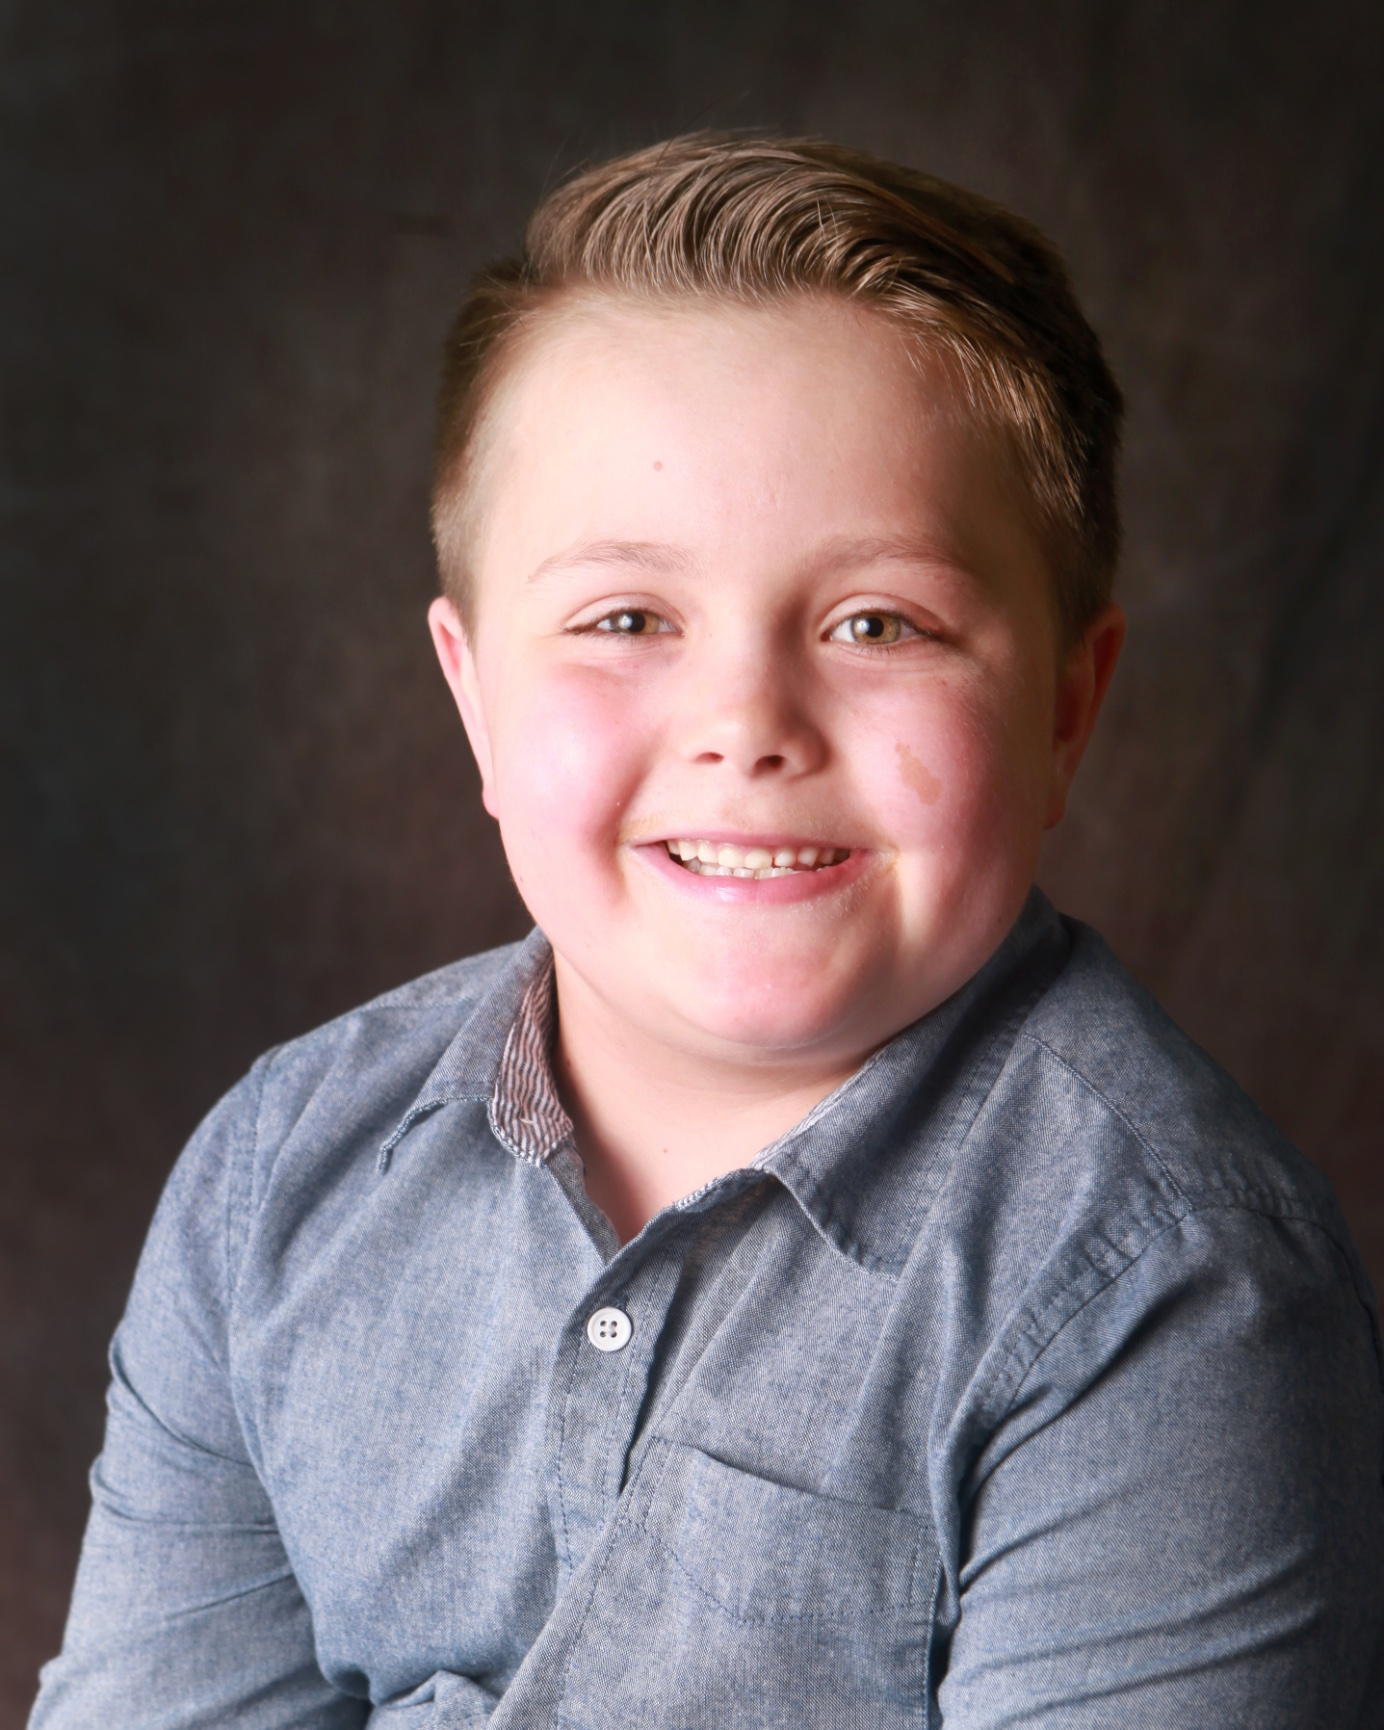 Connor Benjamin, 7, Richardson